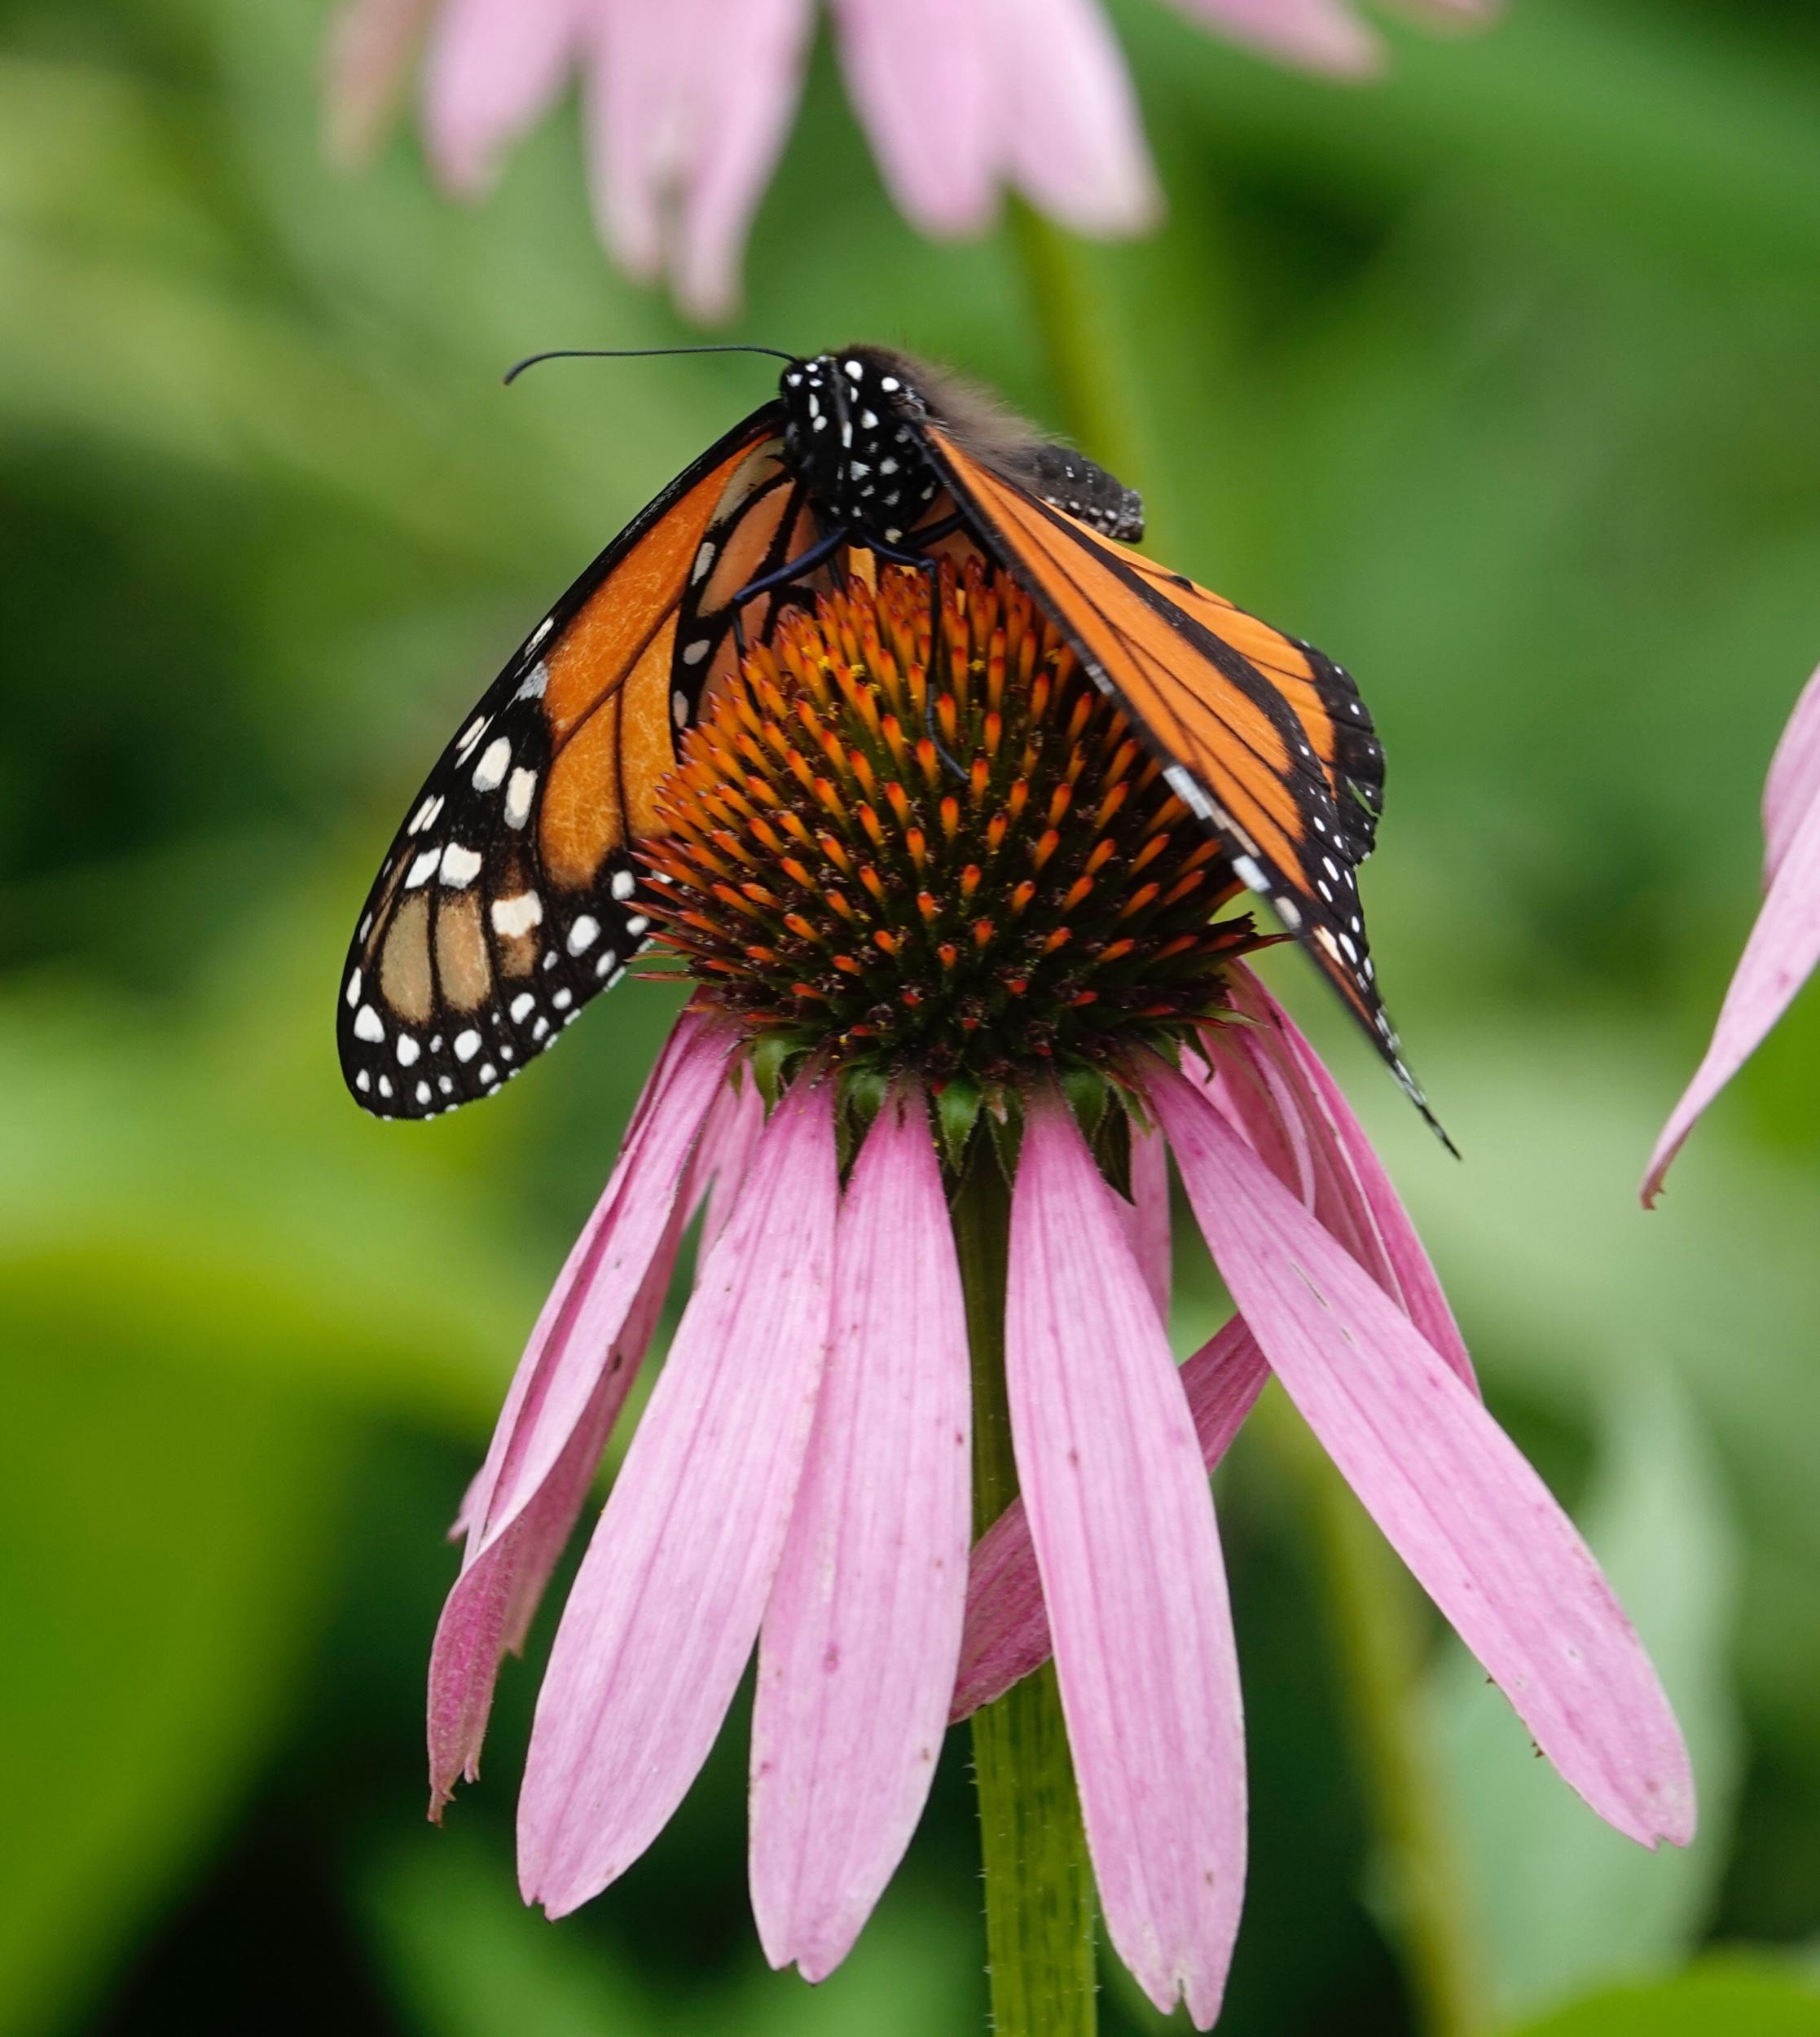 A monarch butterfly hangs on in the wind.